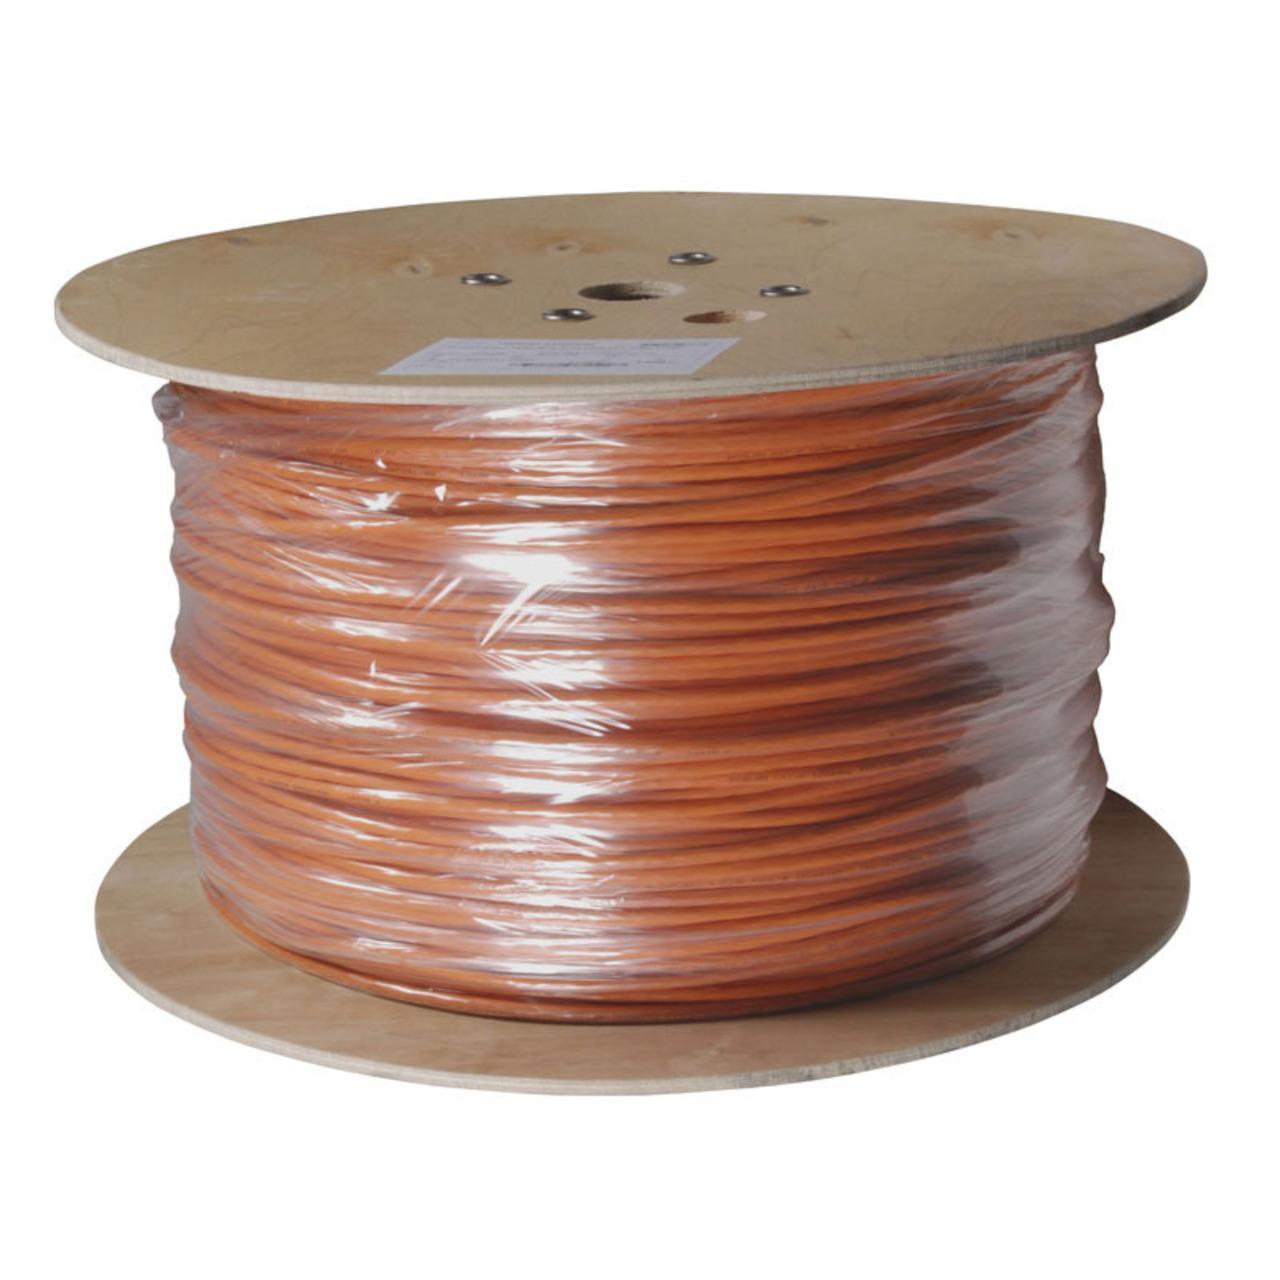 EFB-Elektronik Verlegekabel Cat. 7 Rohkabel, 1000, AWG23, S/FTP, 4P, FRNC, 200 m